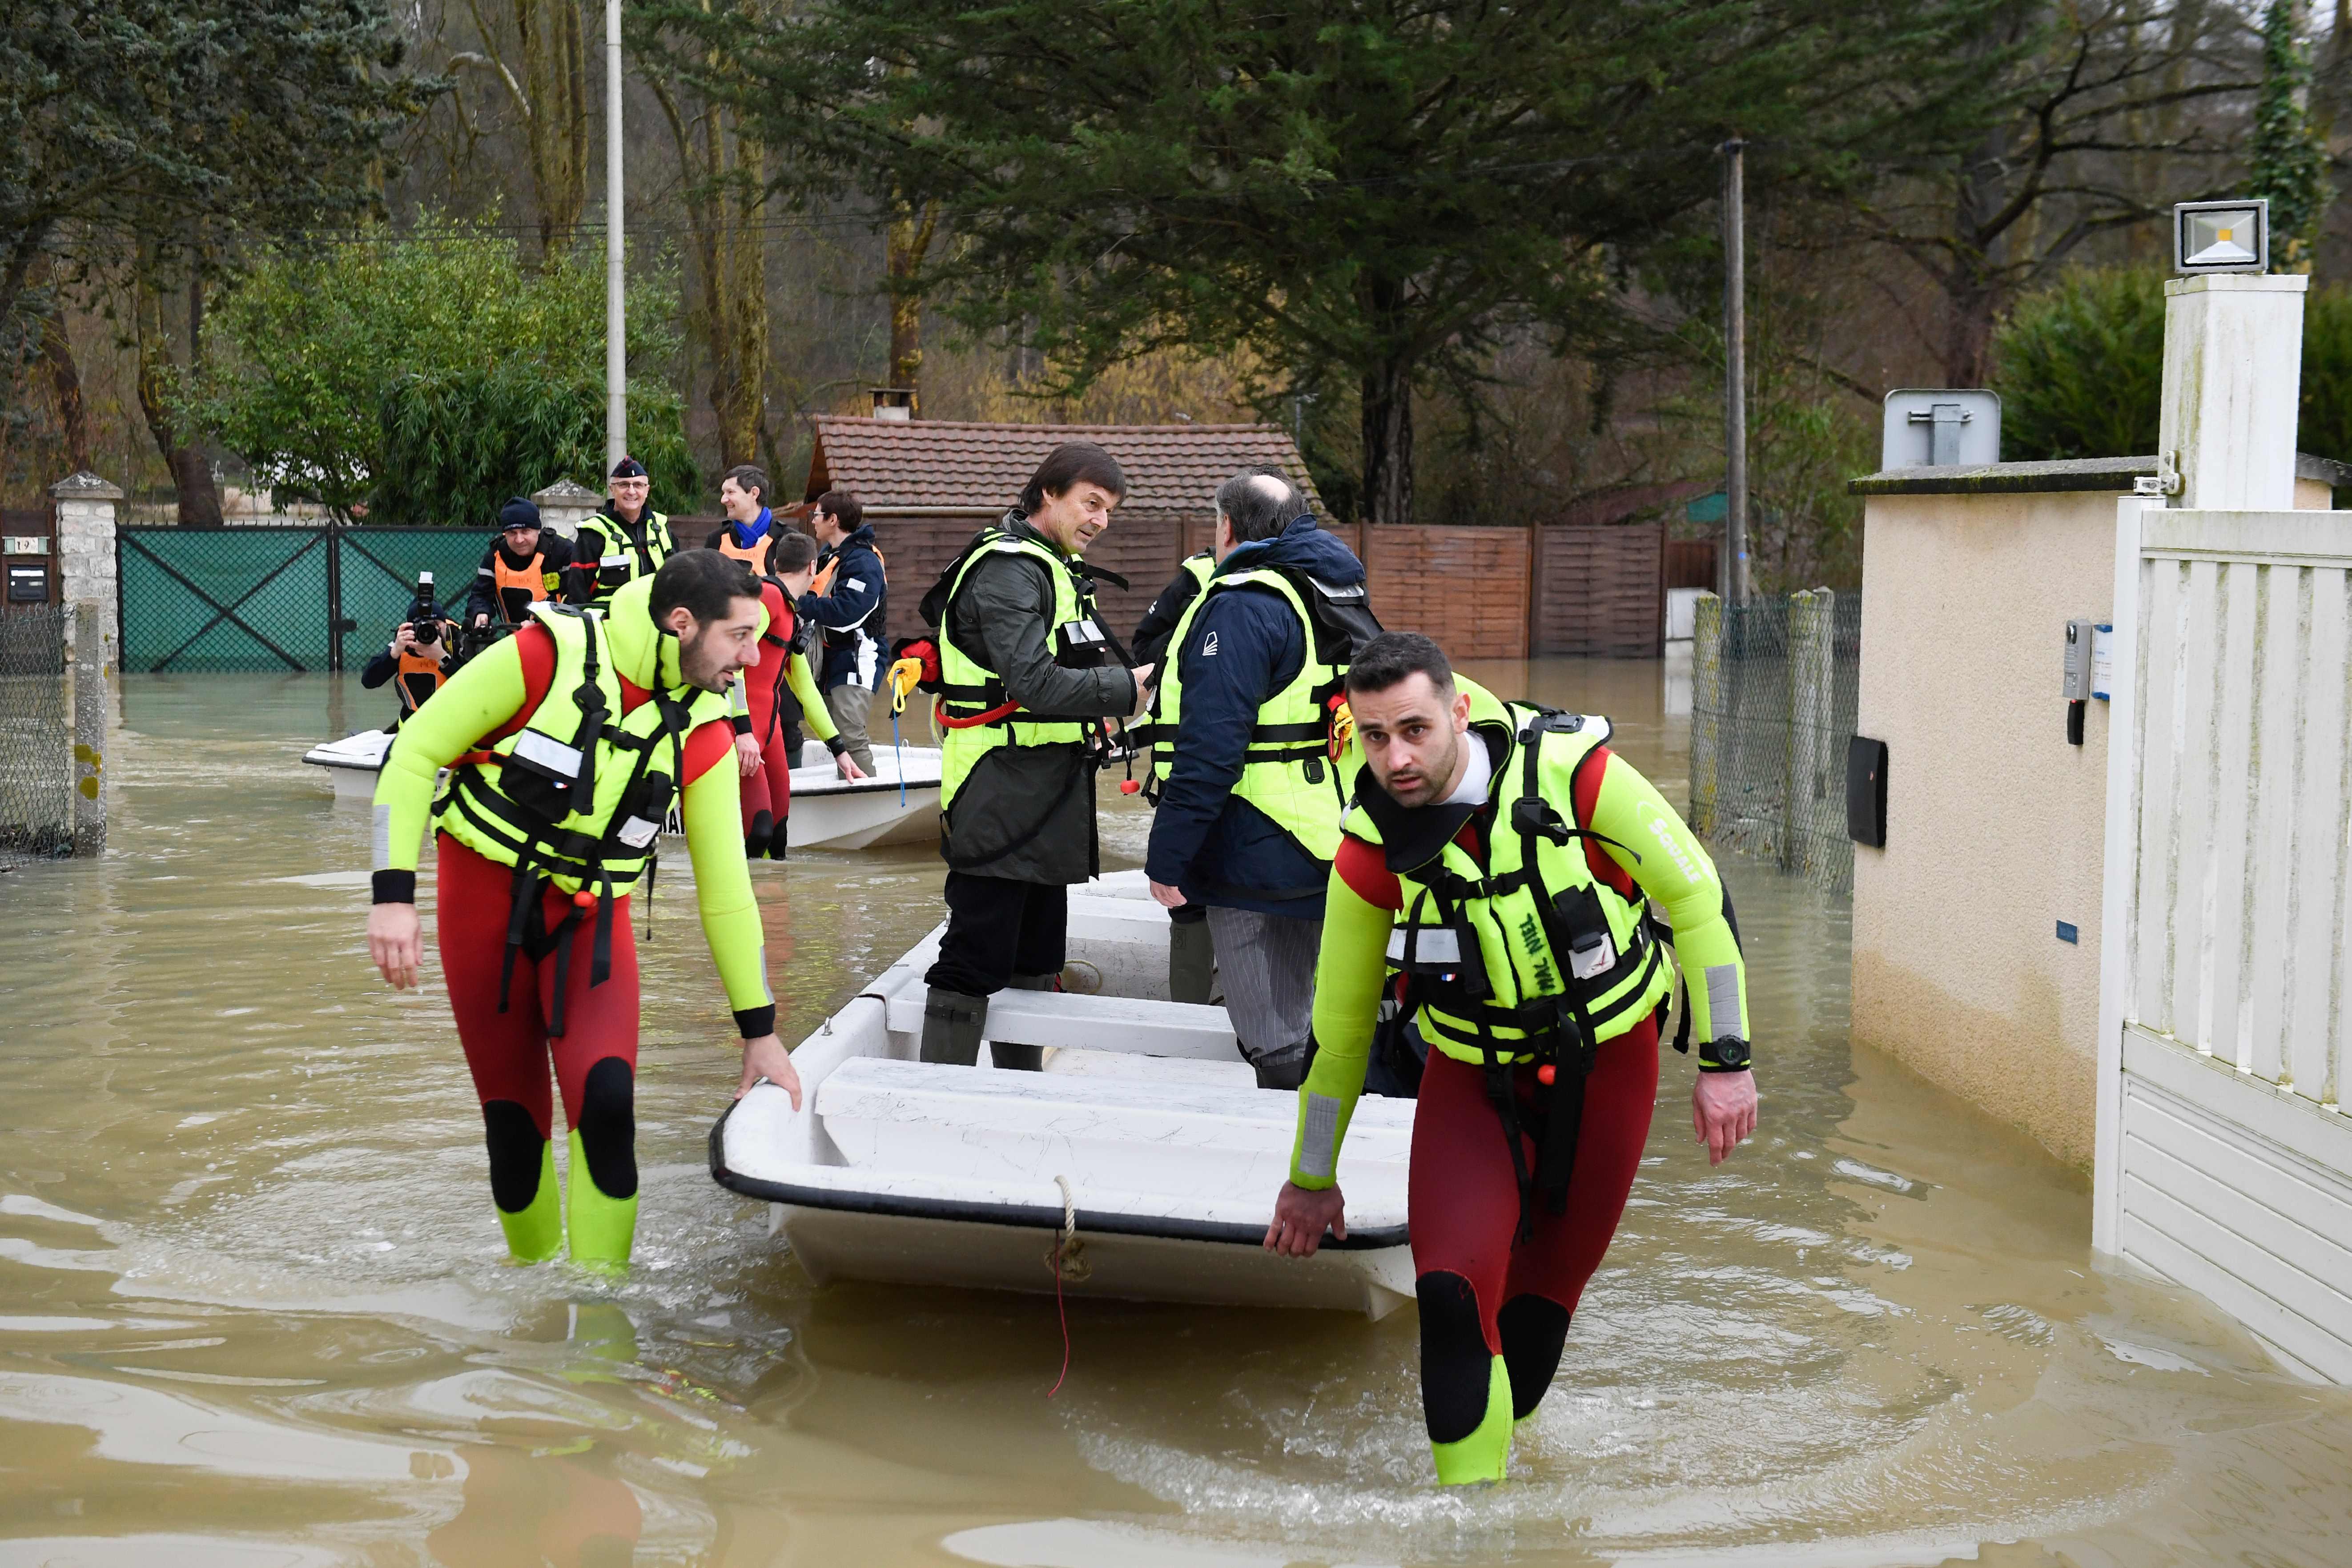 政府官員搭小艇勘災。Getty Images